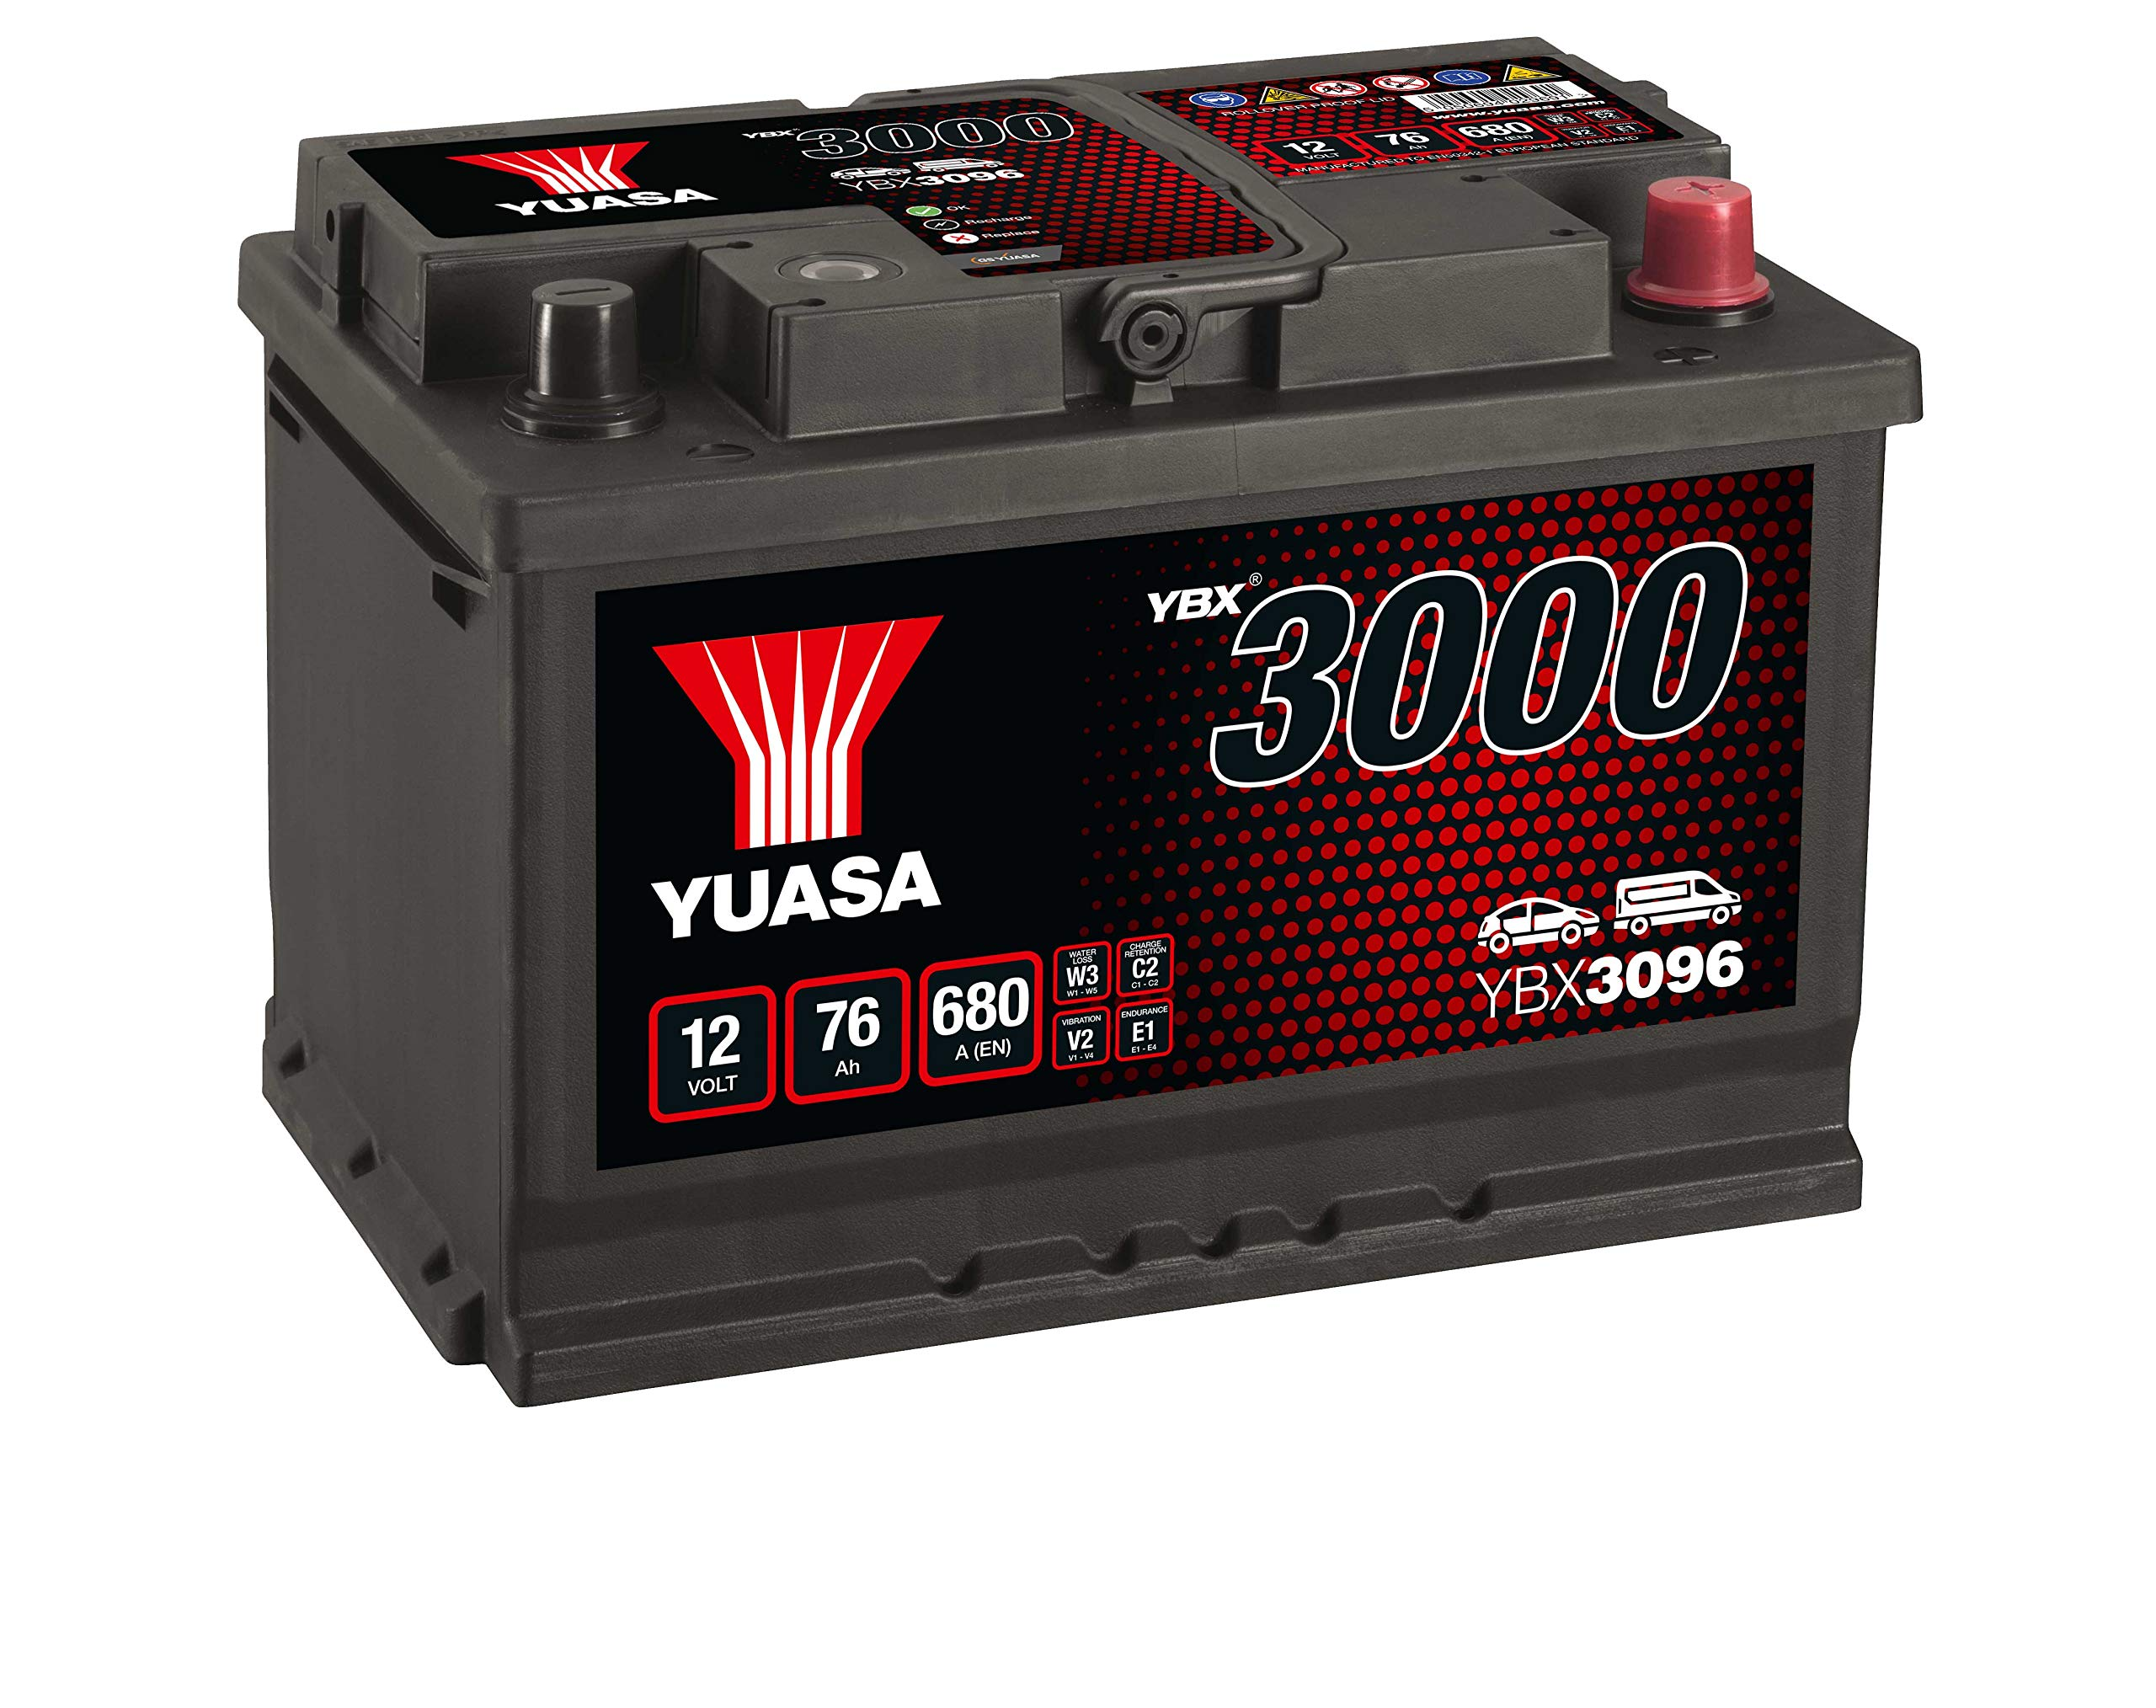 Yuasa YBX3096 12V 76Ah 680A SMF Battery